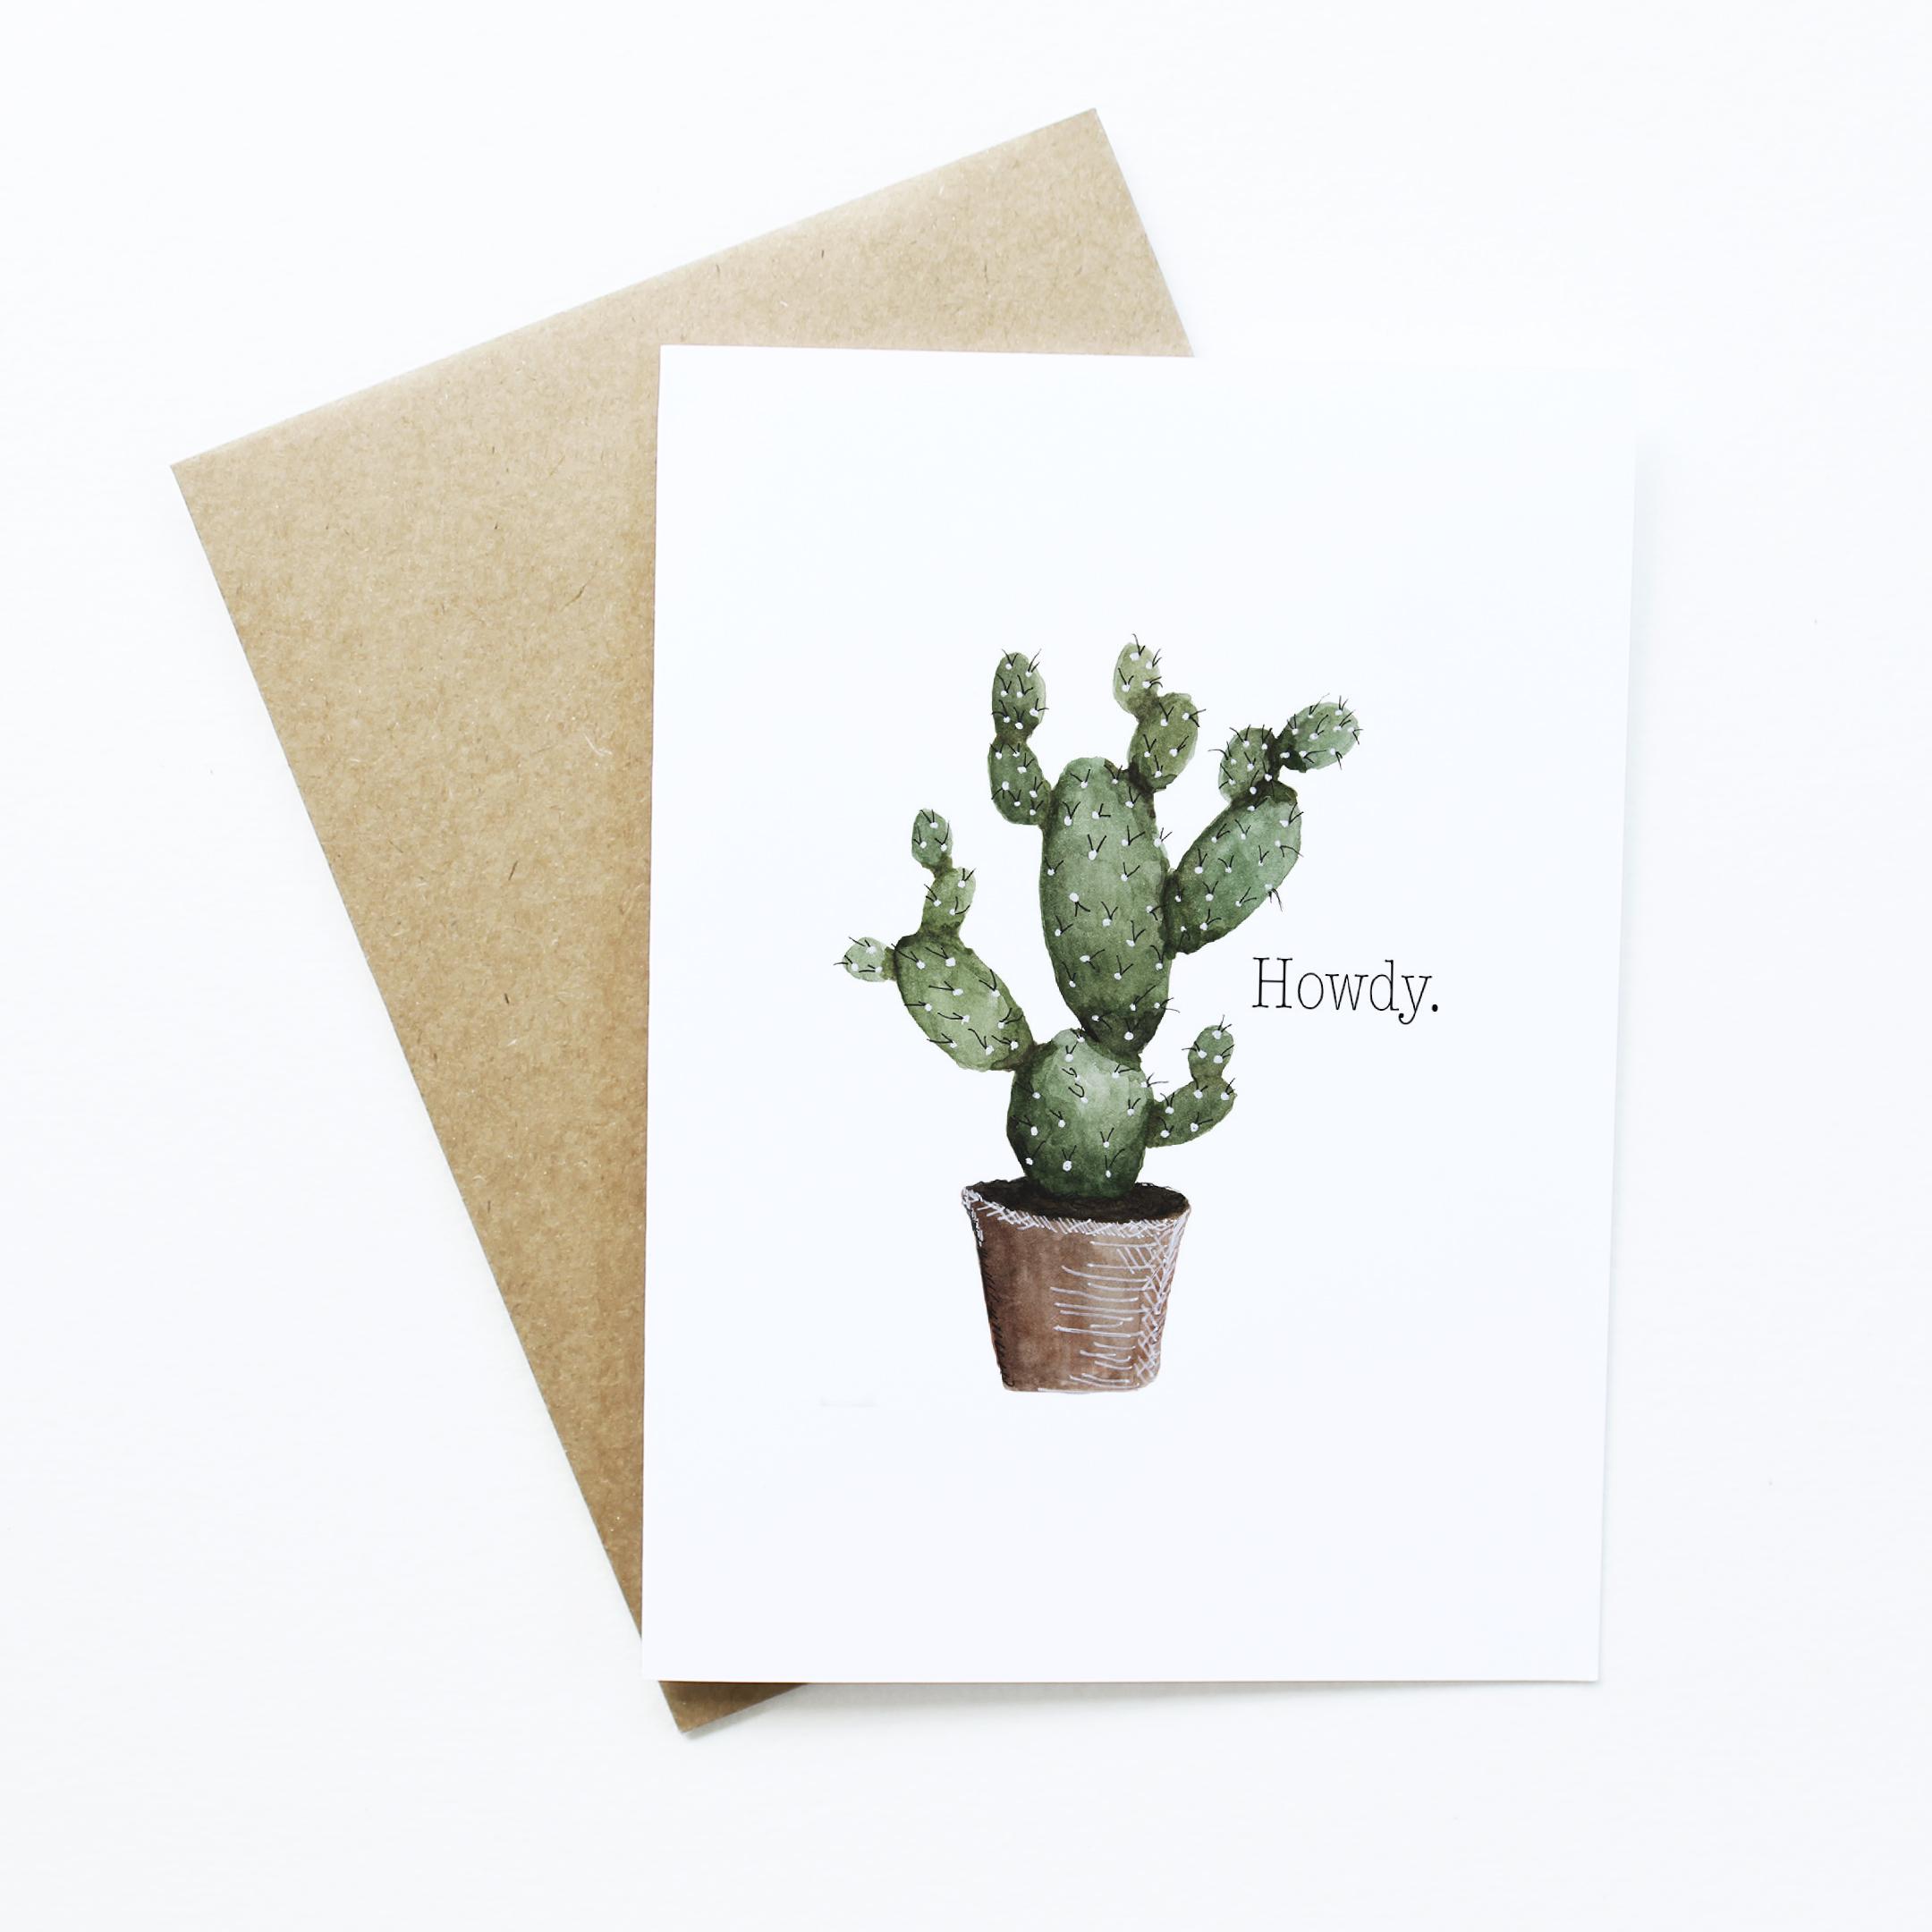 cactus howdy card mockup.JPG